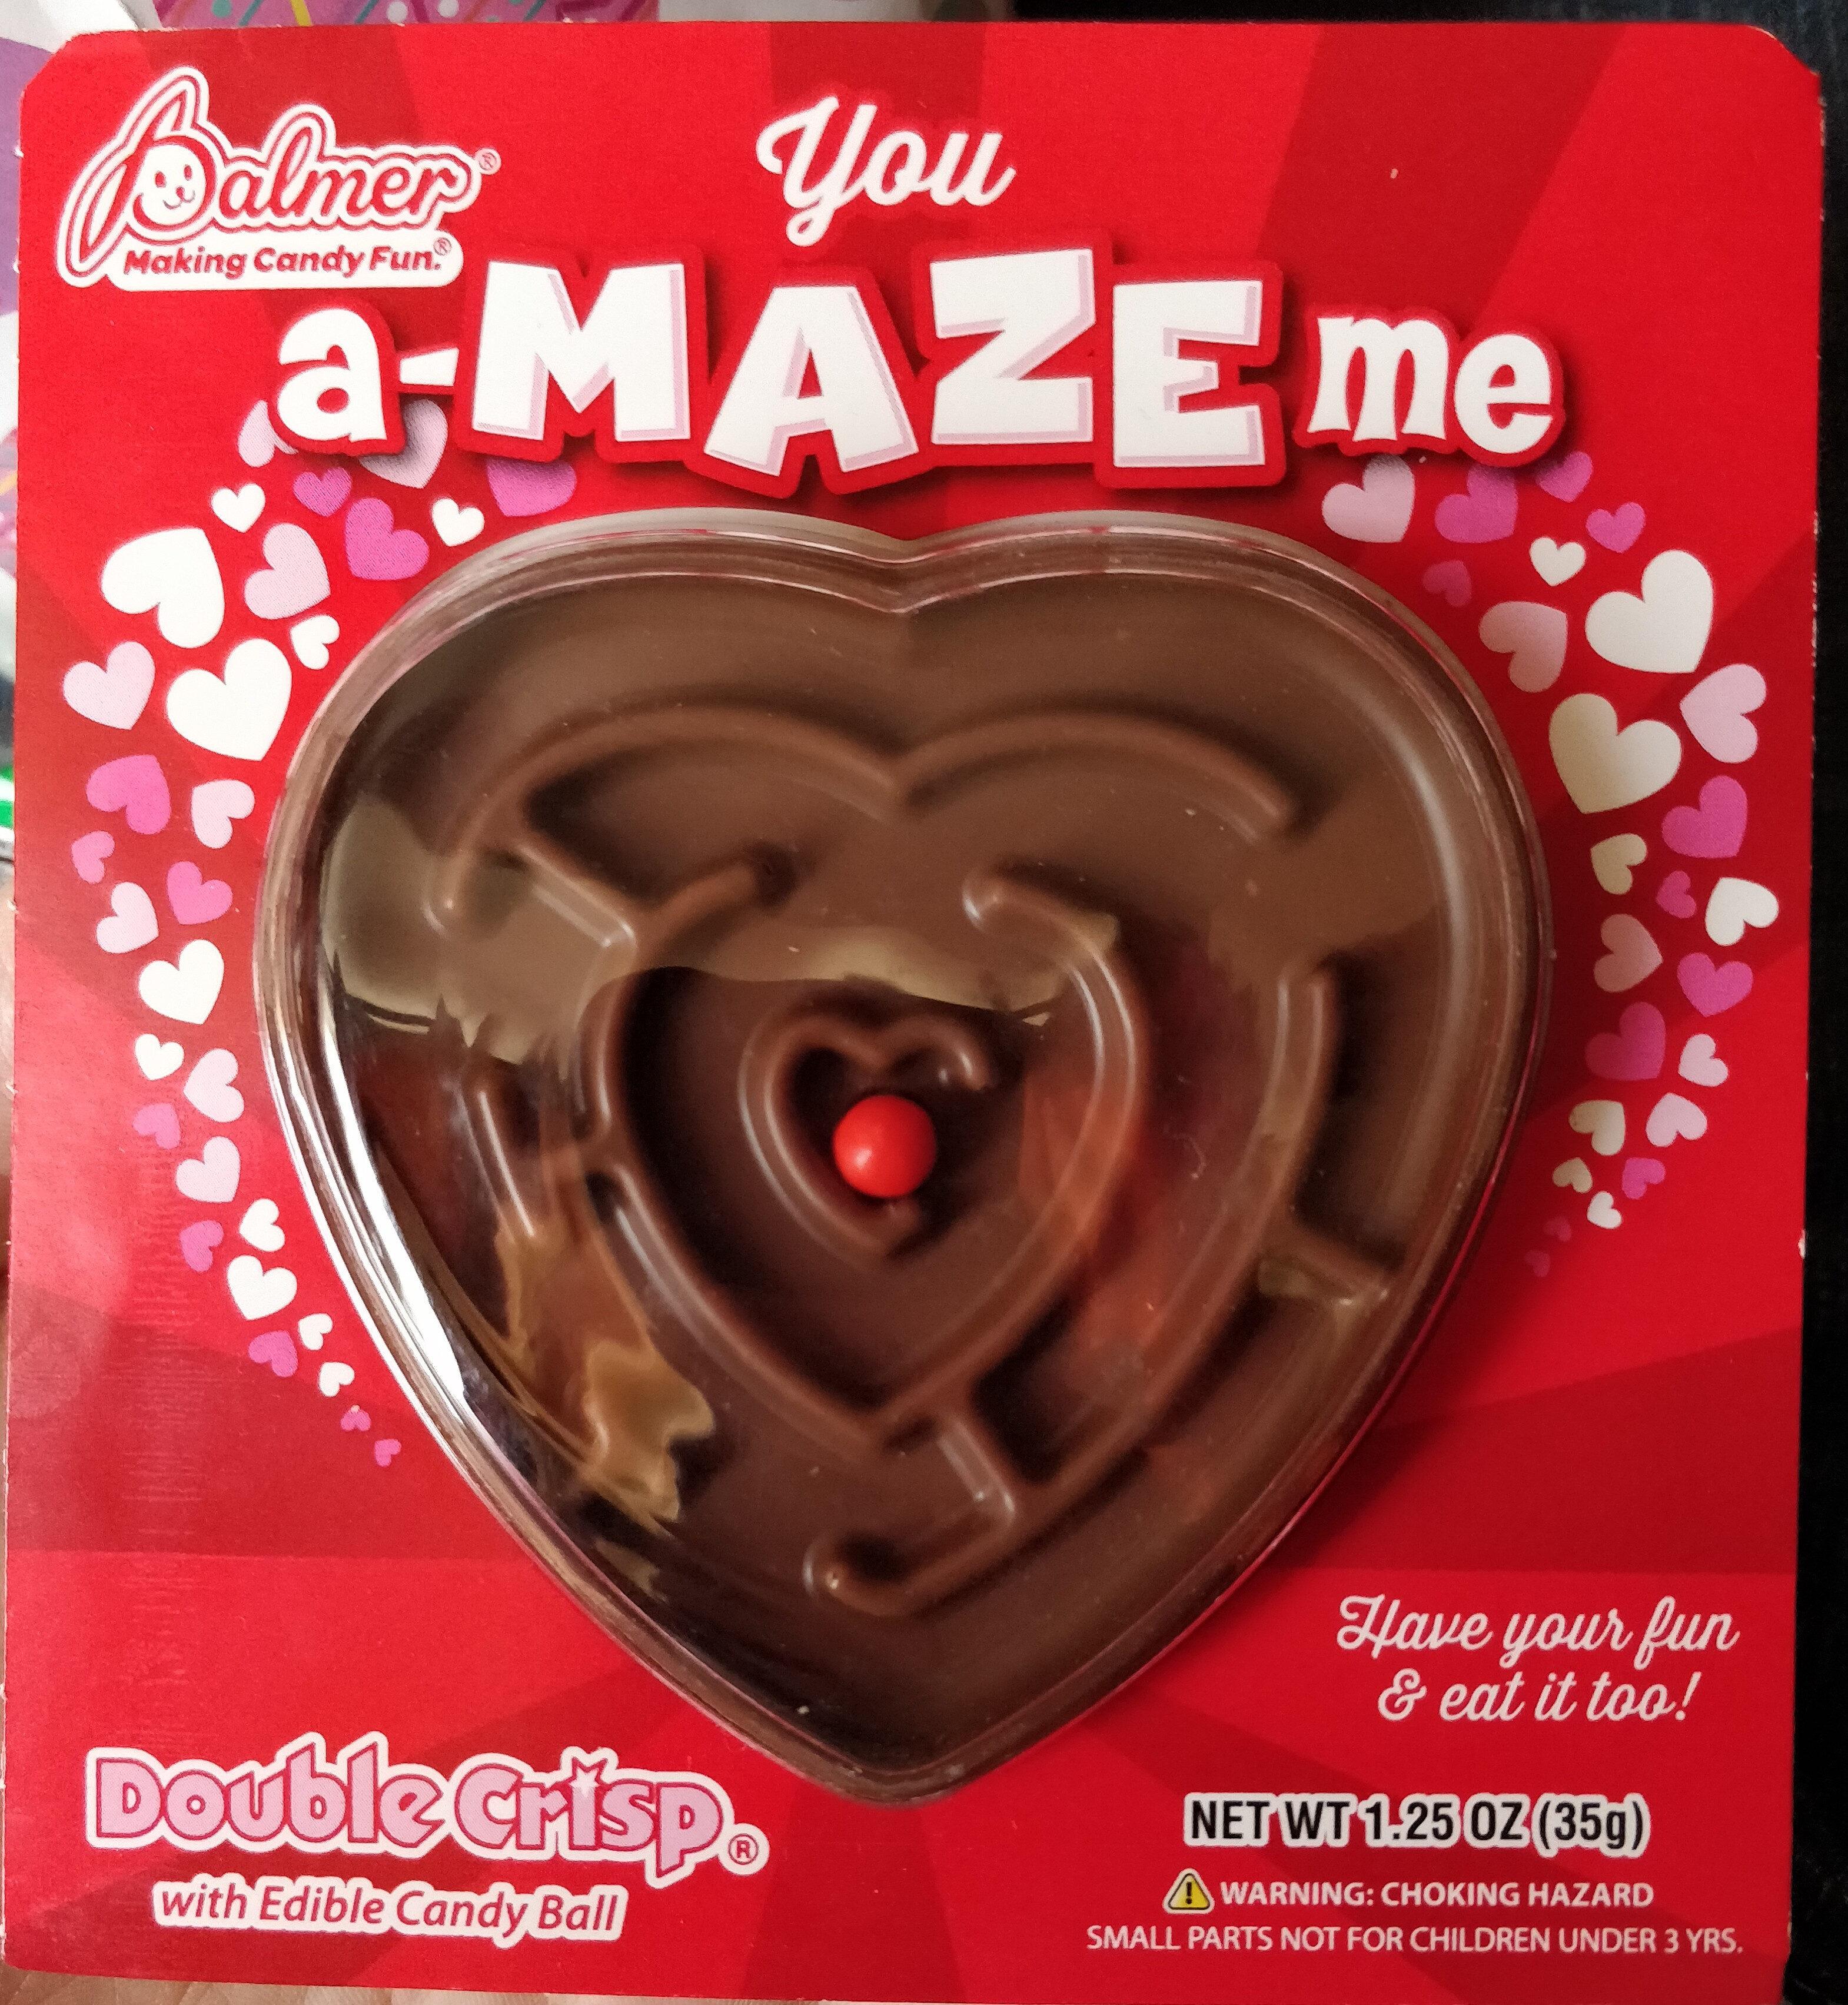 Double crisp chocolaty 'n smooth... crisp 'n cruncy candy ball - Product - en